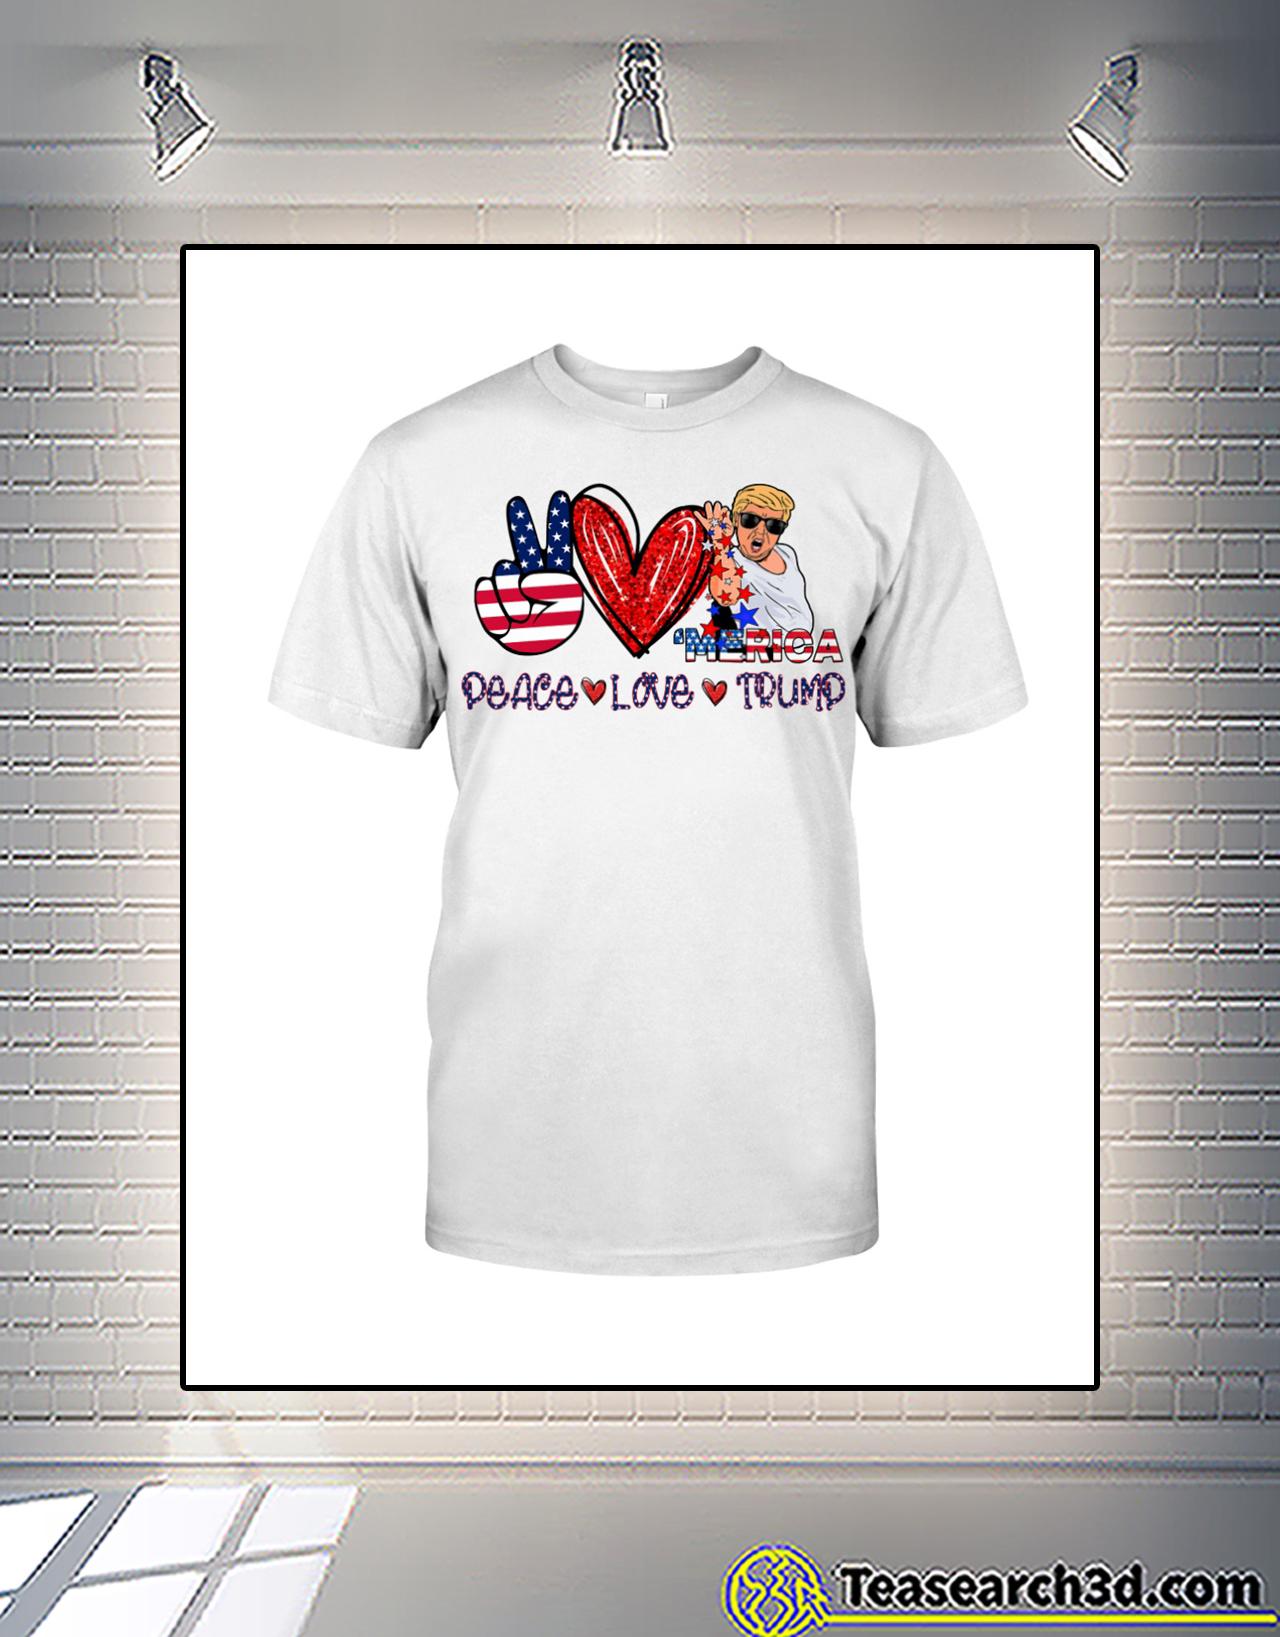 Trump Salt bae merica peace love trump shirt